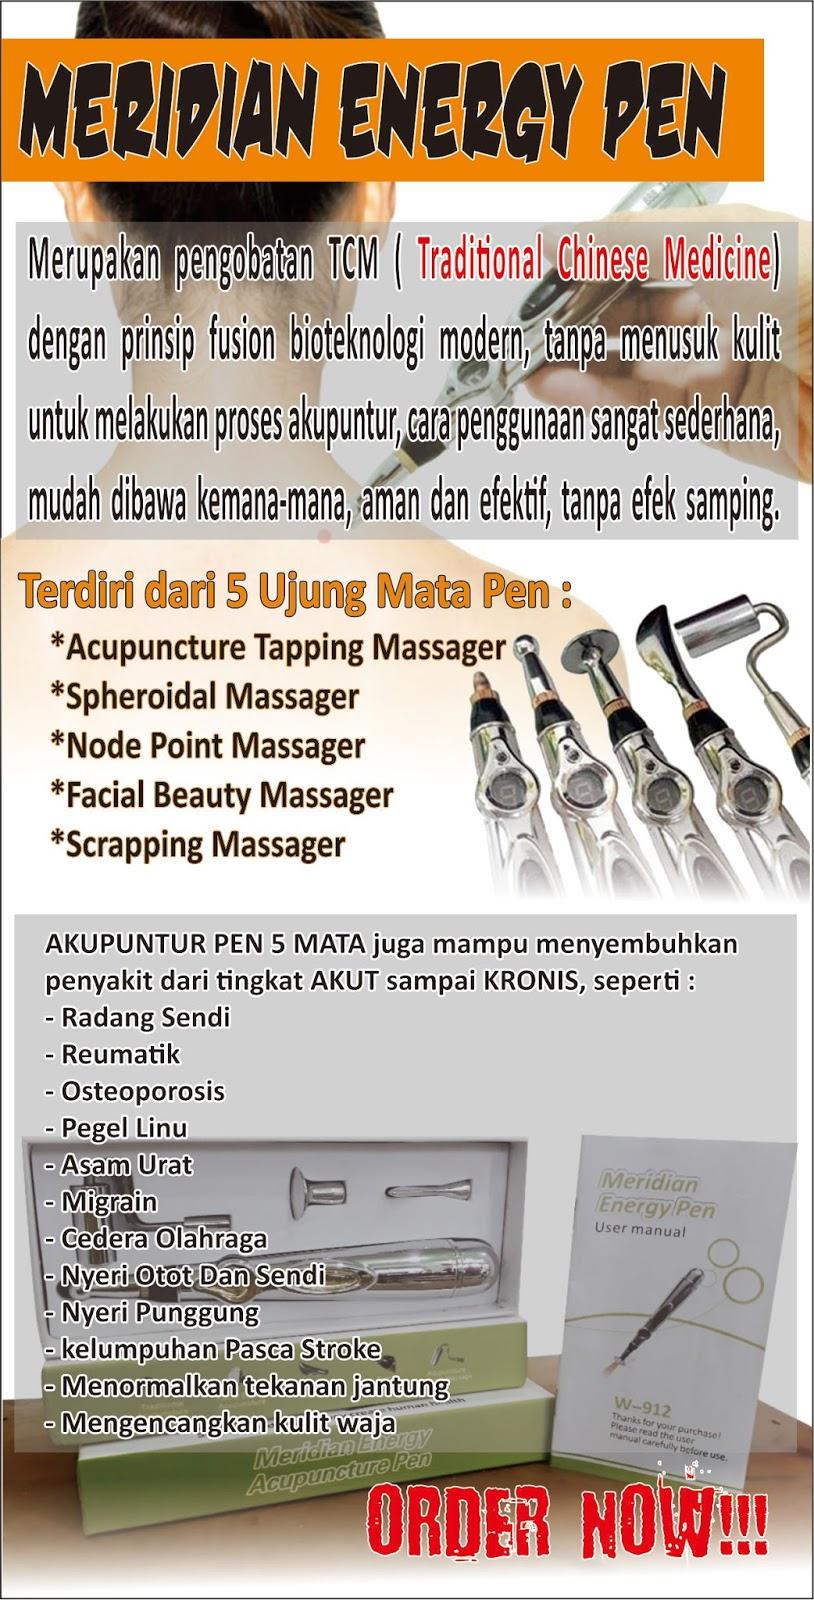 Hand Accupuncture Plus Terapi Box Koper Pen Akupuntur Software Brosur